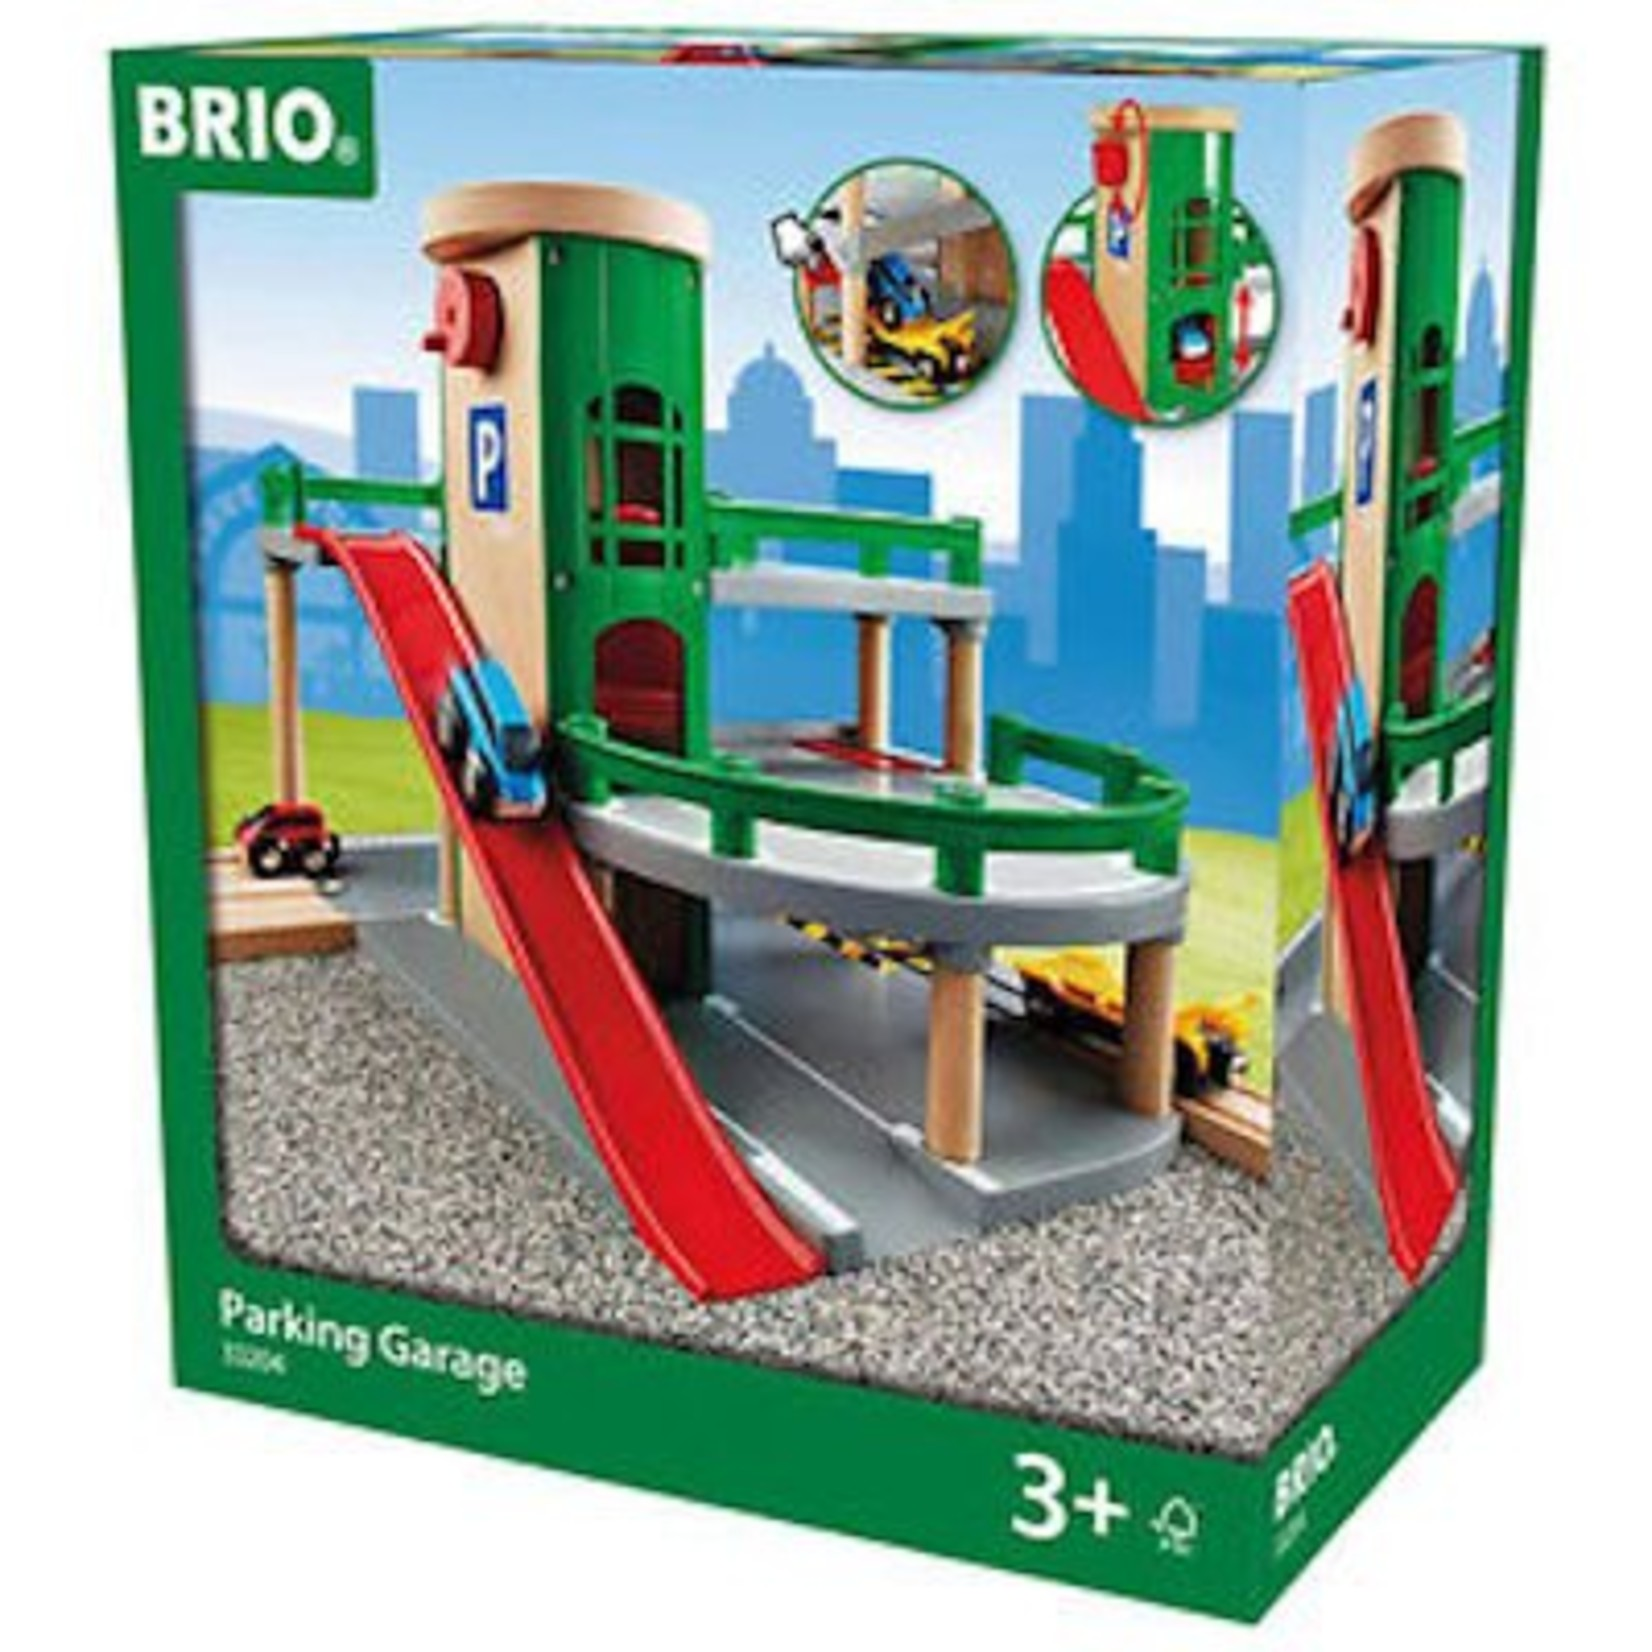 Brio Parkeer Garage